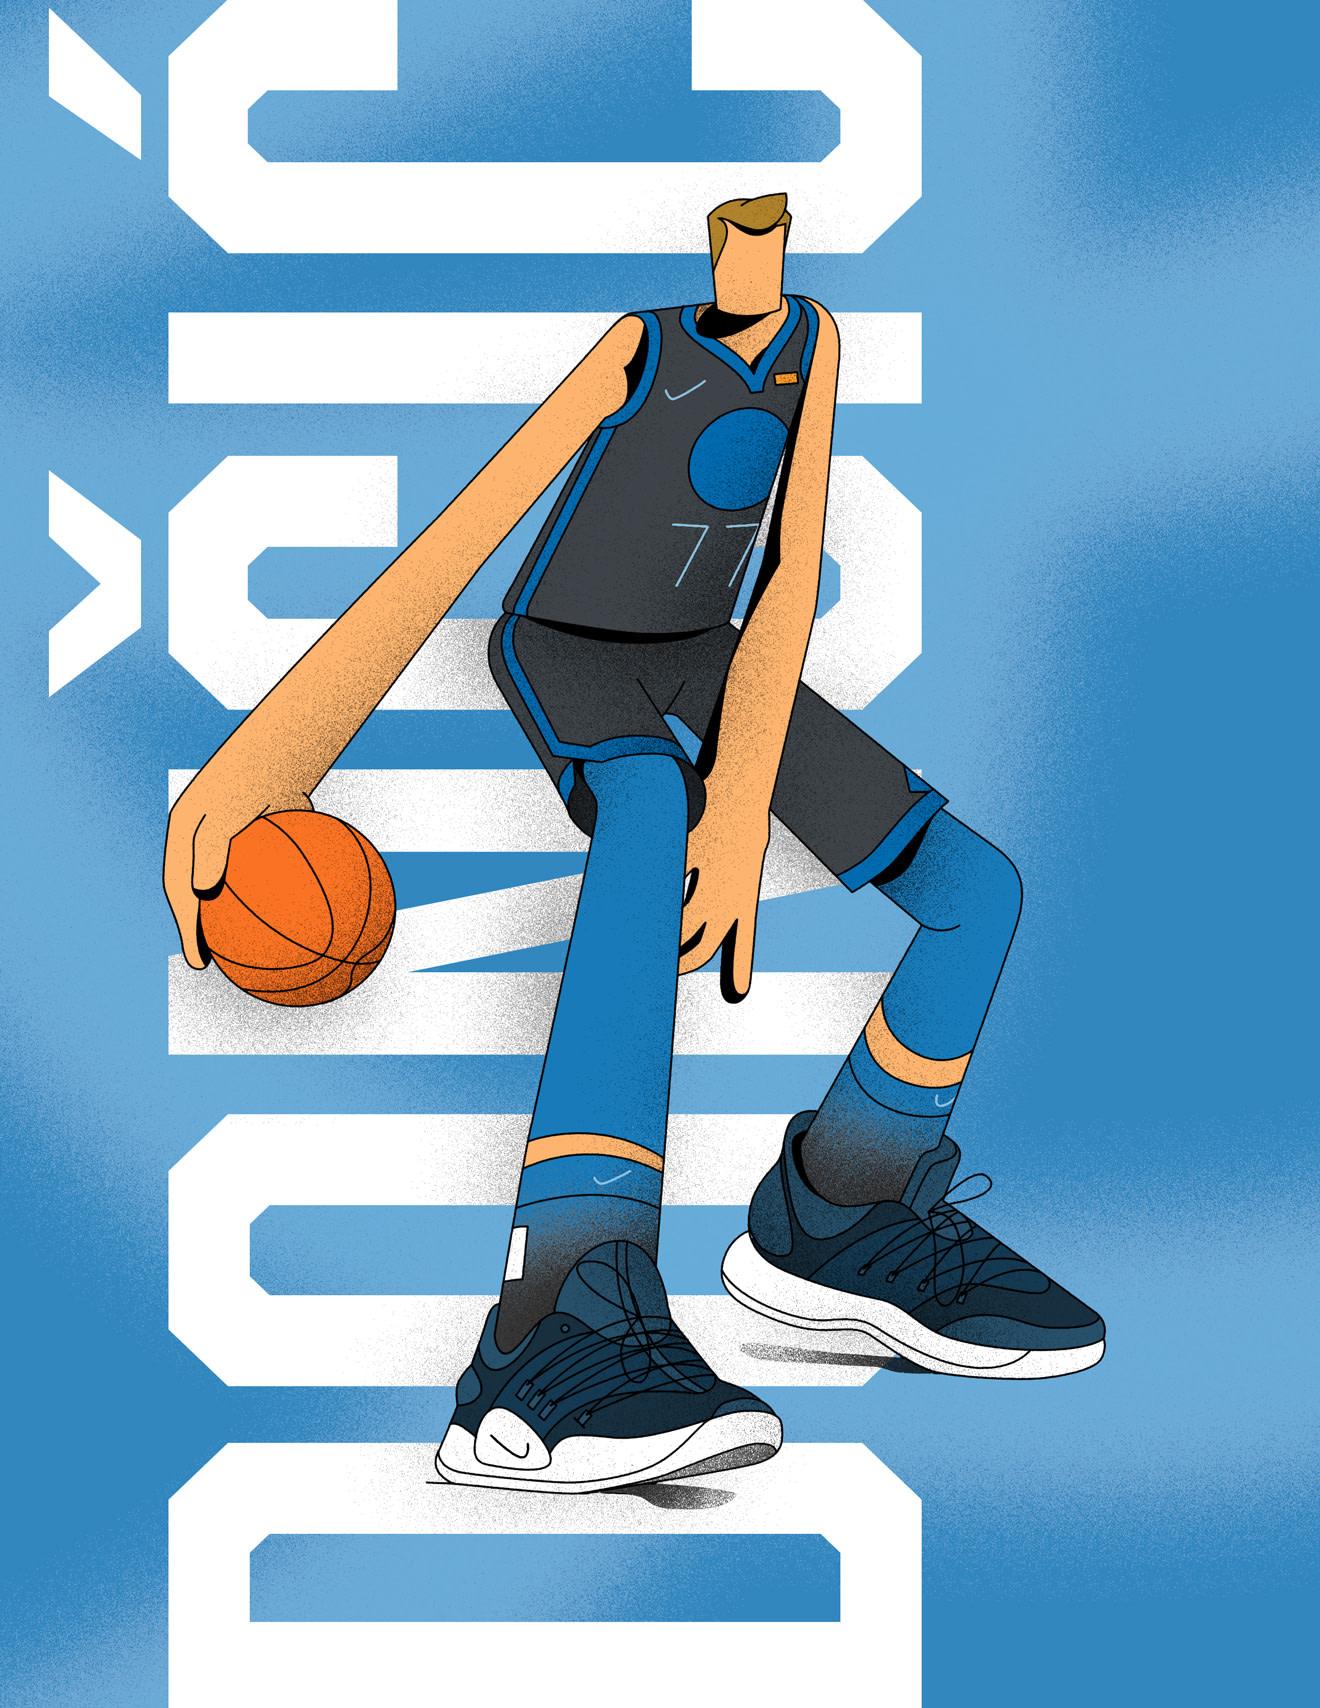 Illustration of basketball player, Luka Doncic, dribbling